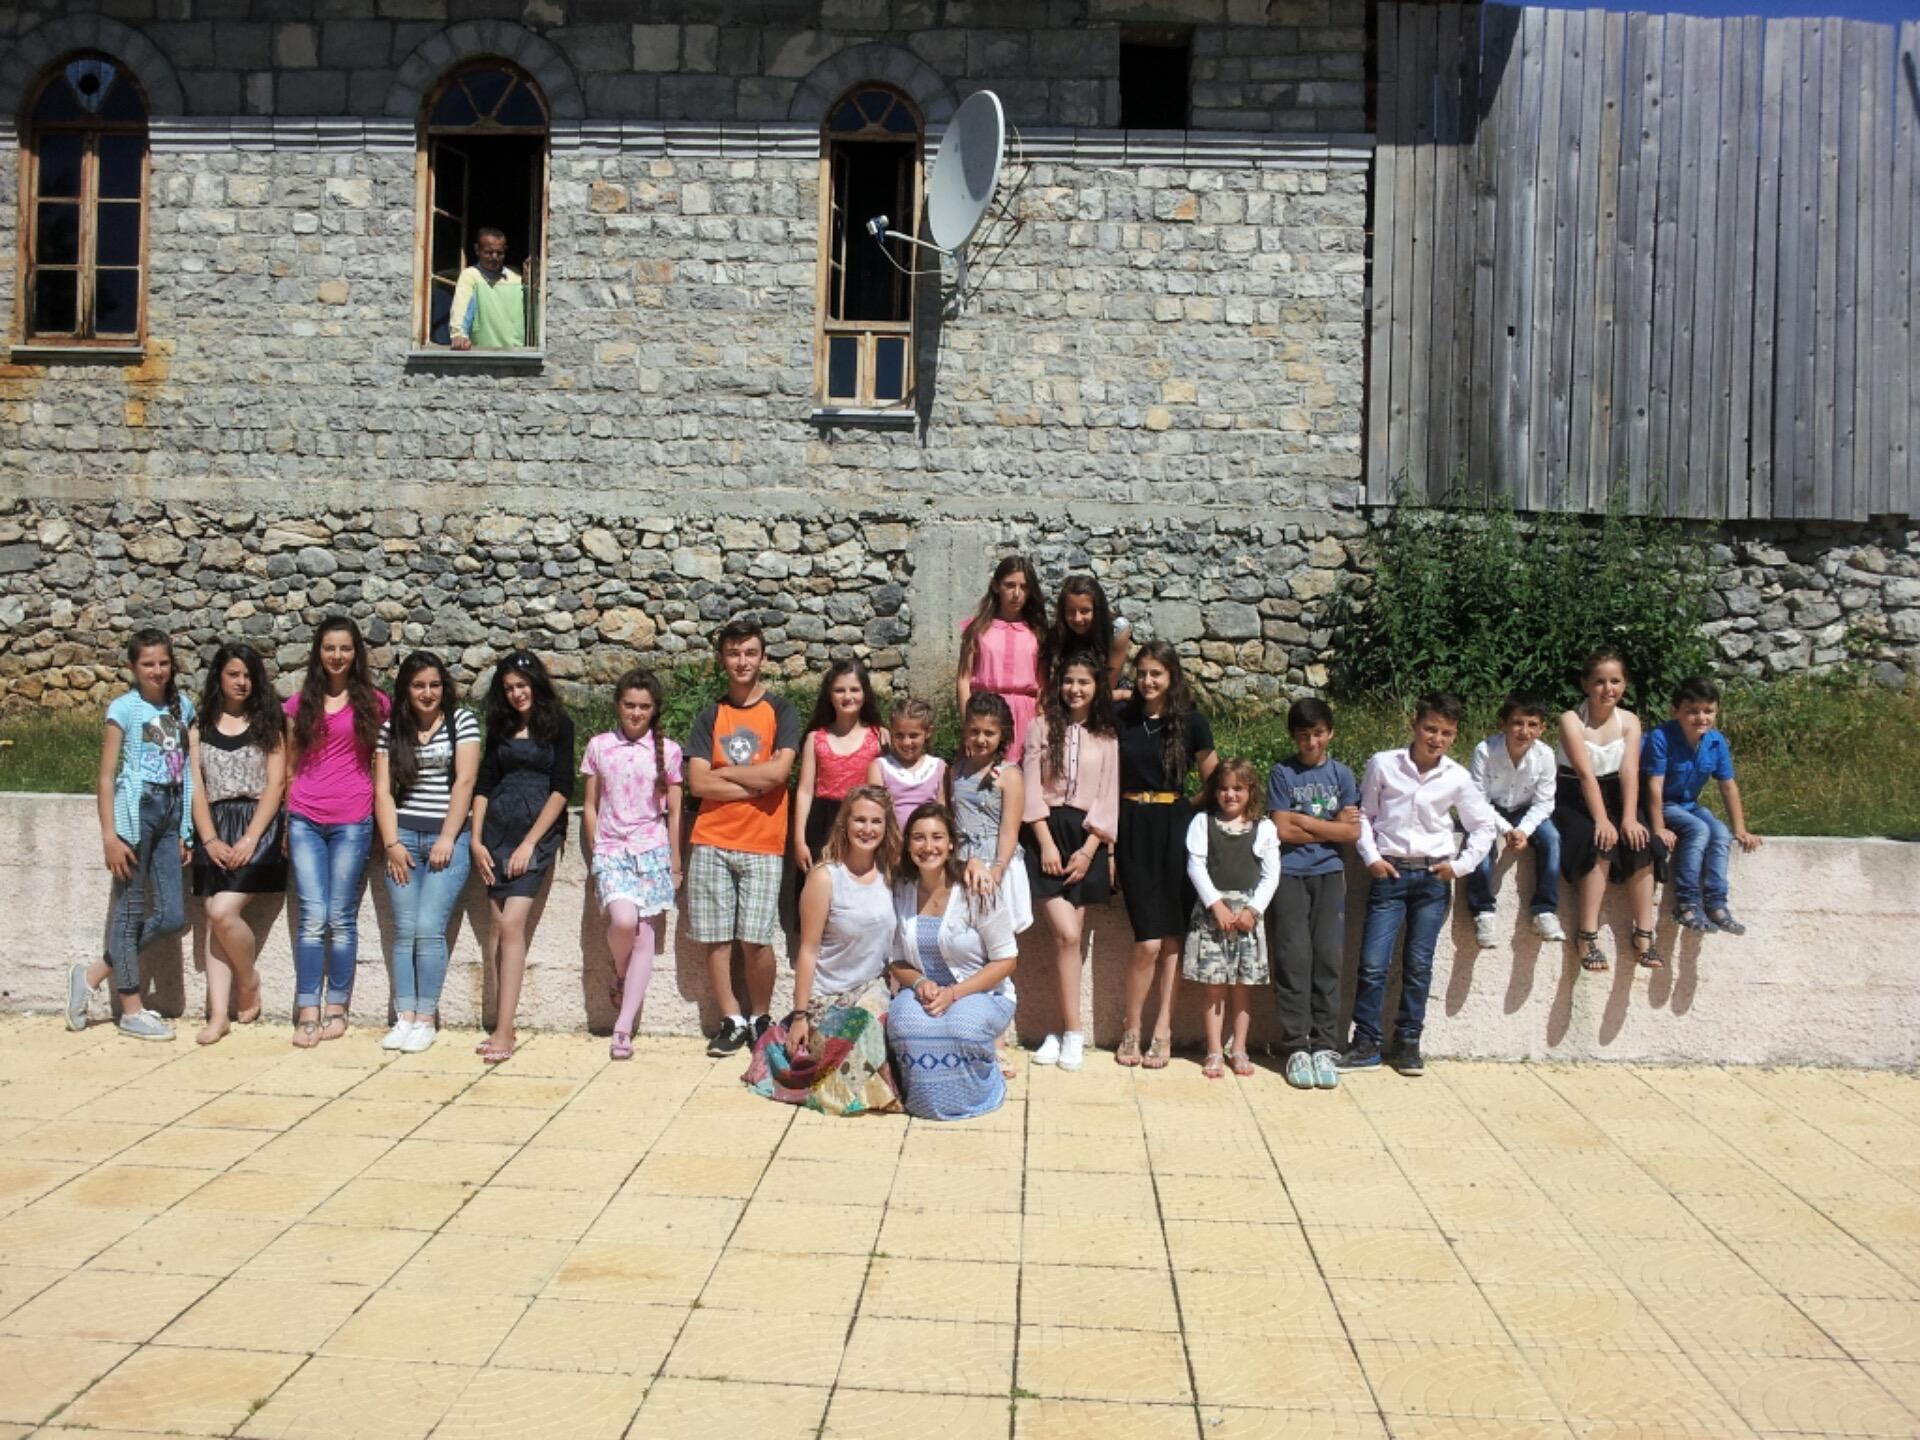 group picture post school dance albania vrith